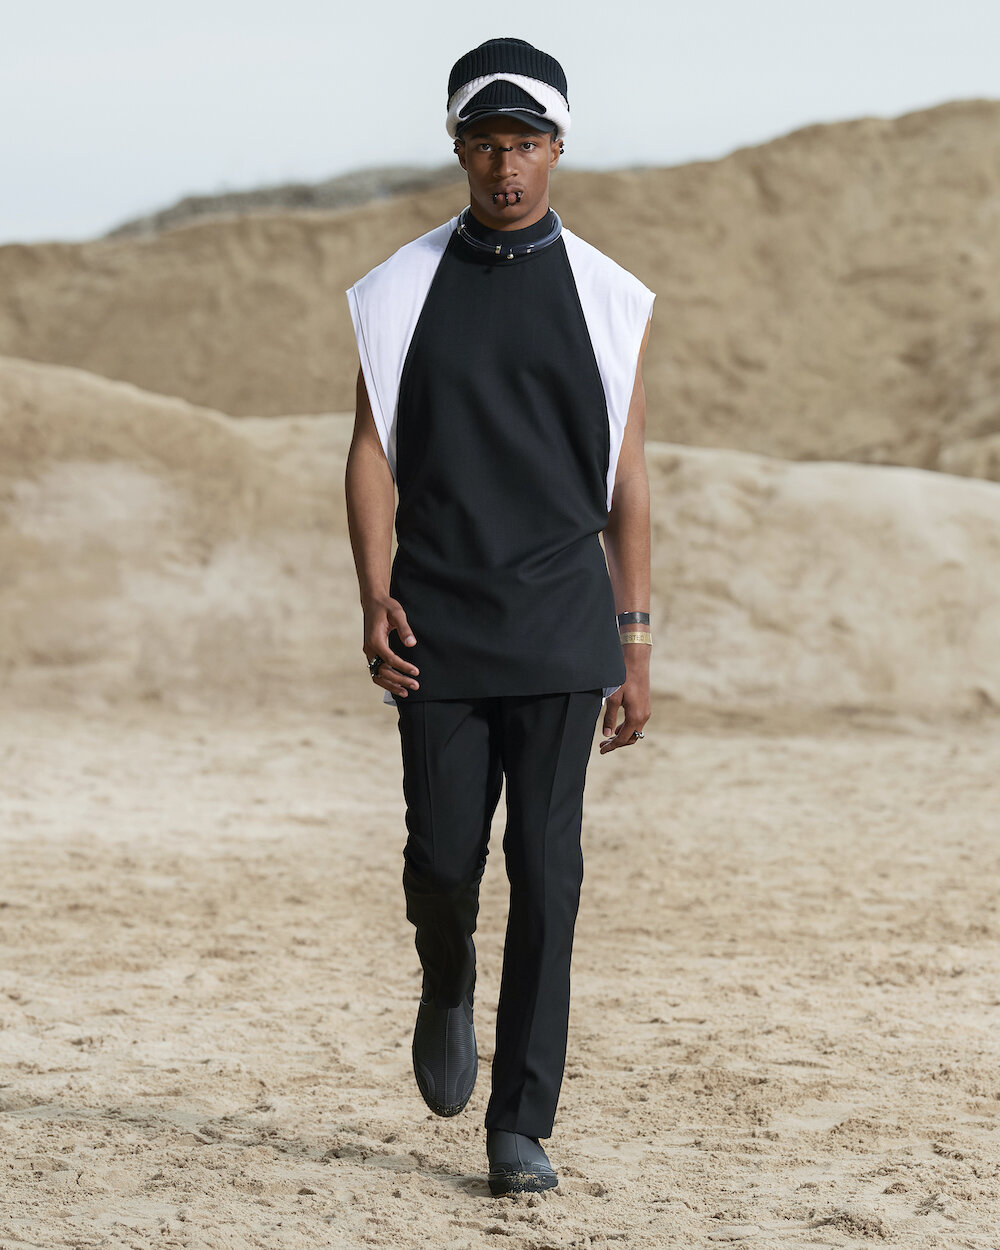 Burberry Spring_Summer 2022 Menswear Presentation Collection - Look 2 - Miles.jpg